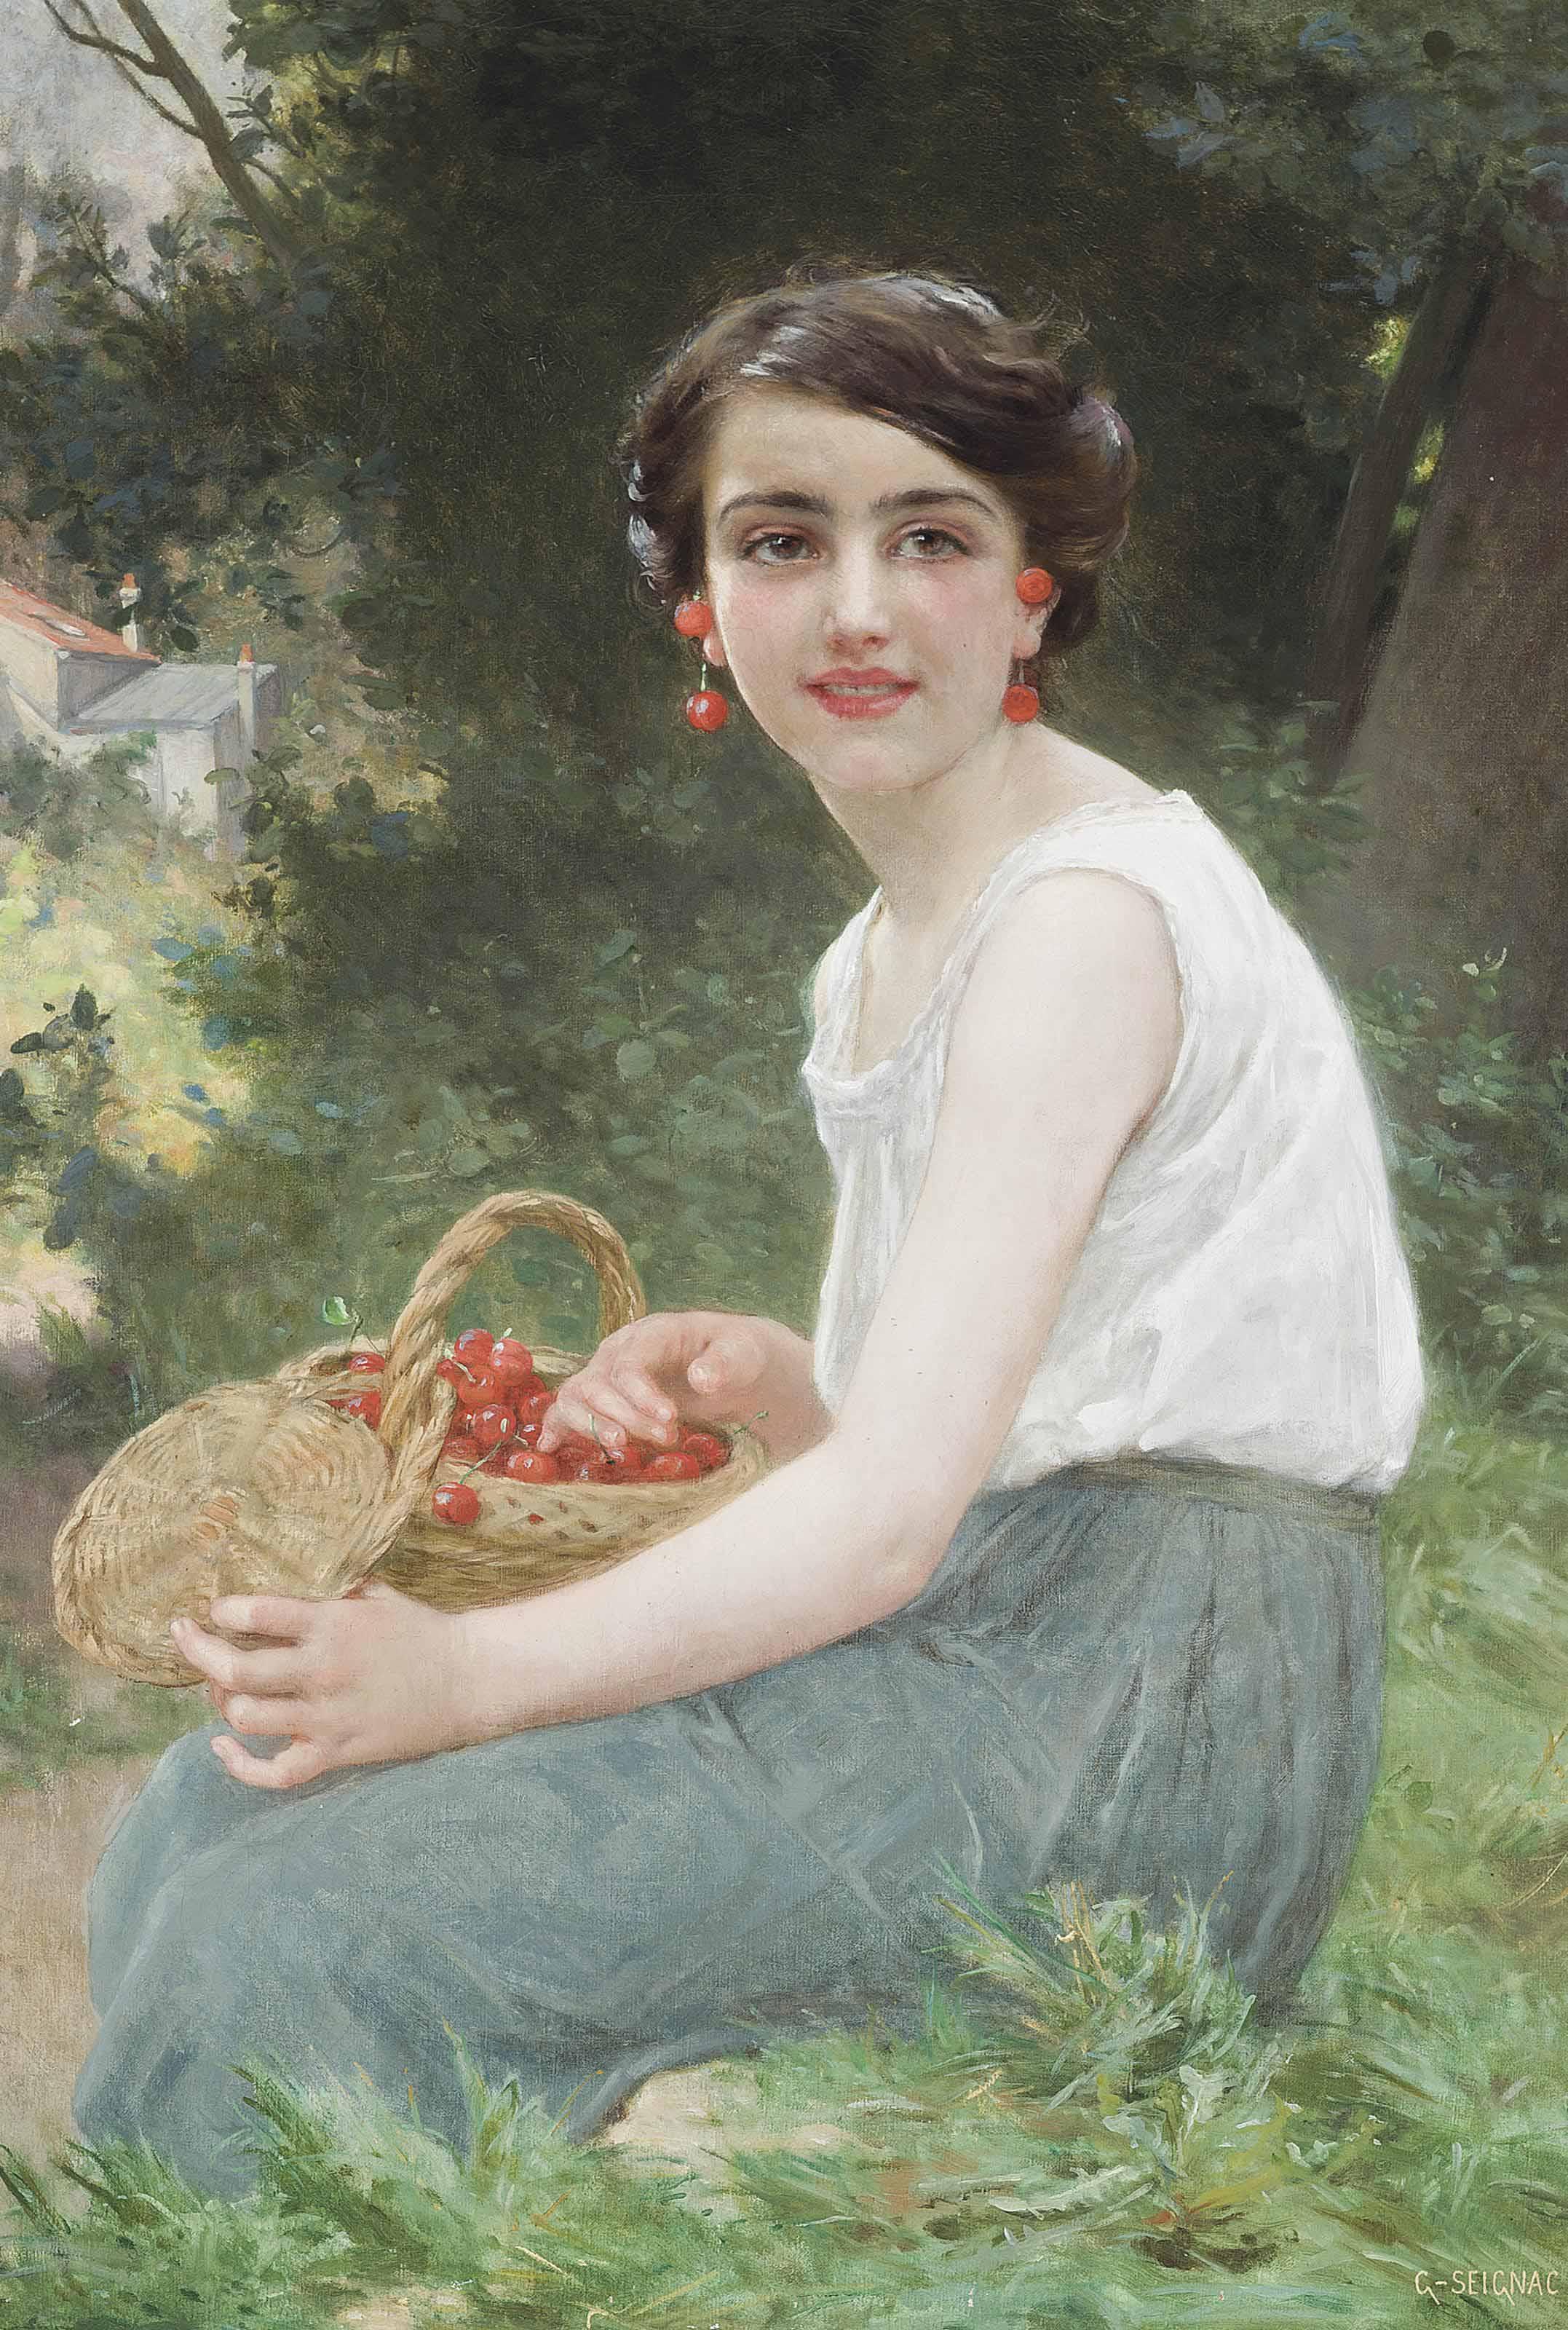 The cherry girl